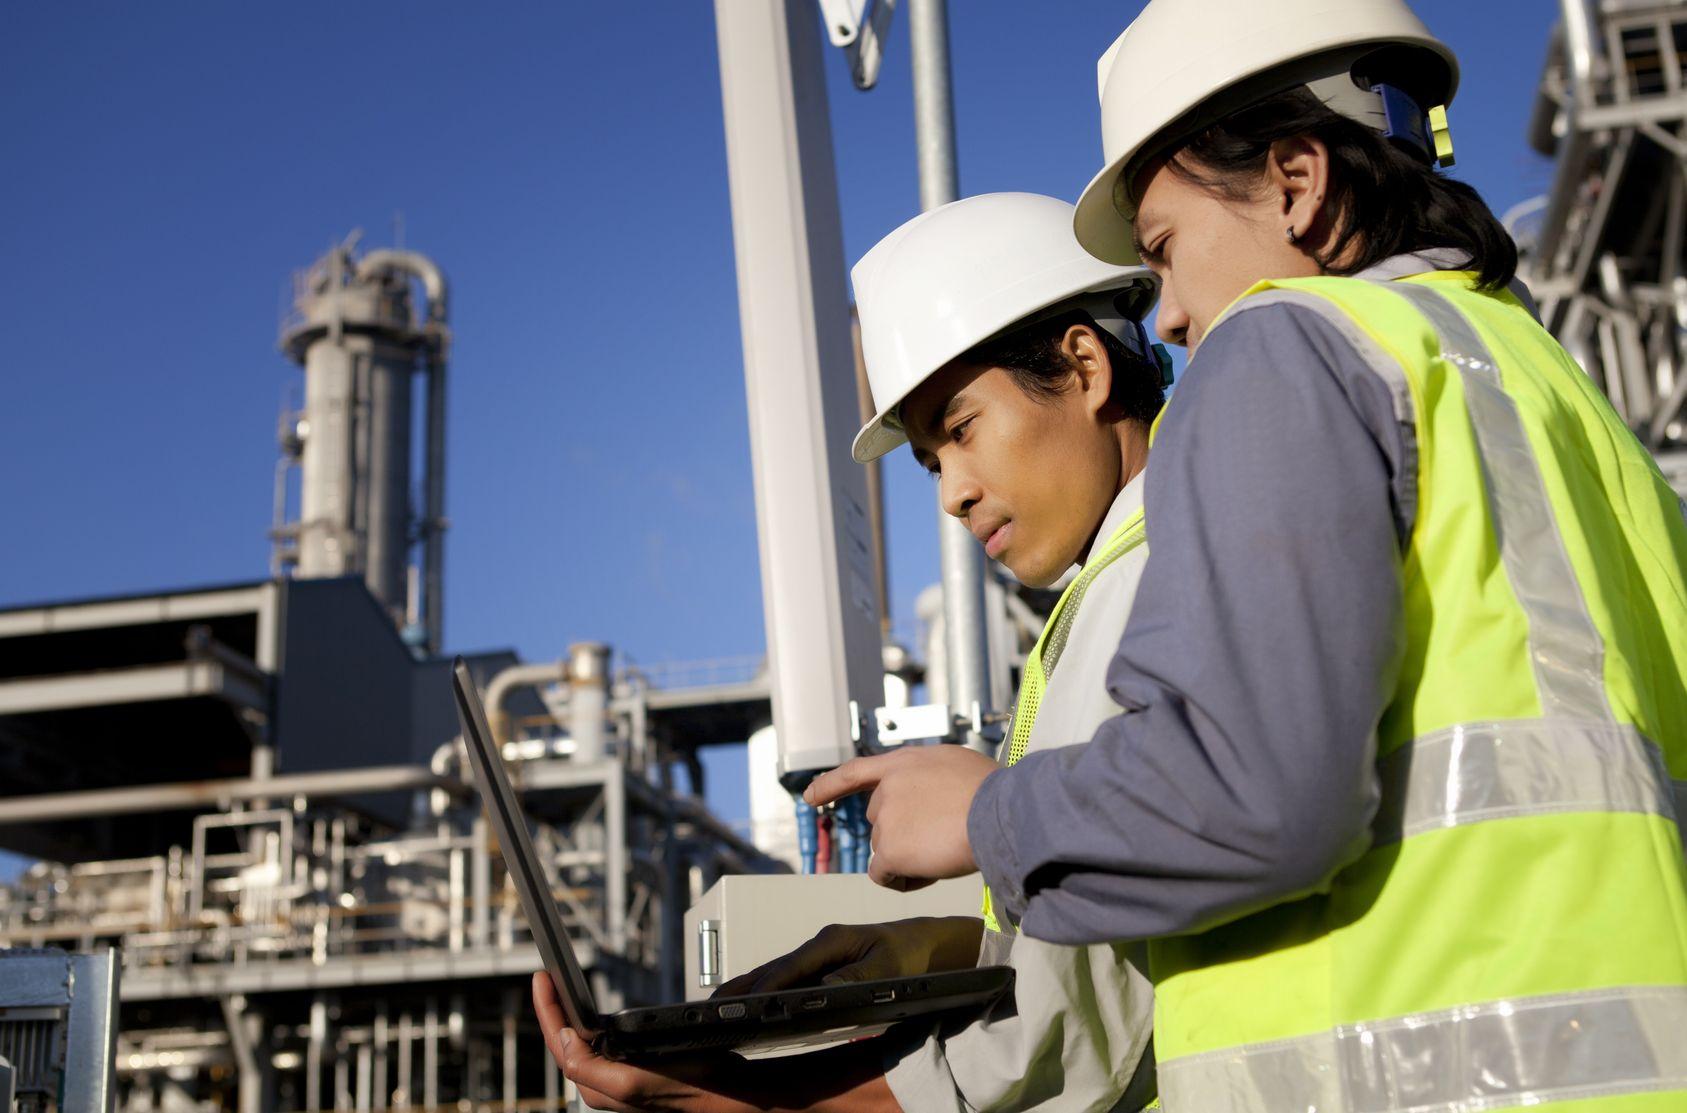 Human Capacity Limits Process Industry